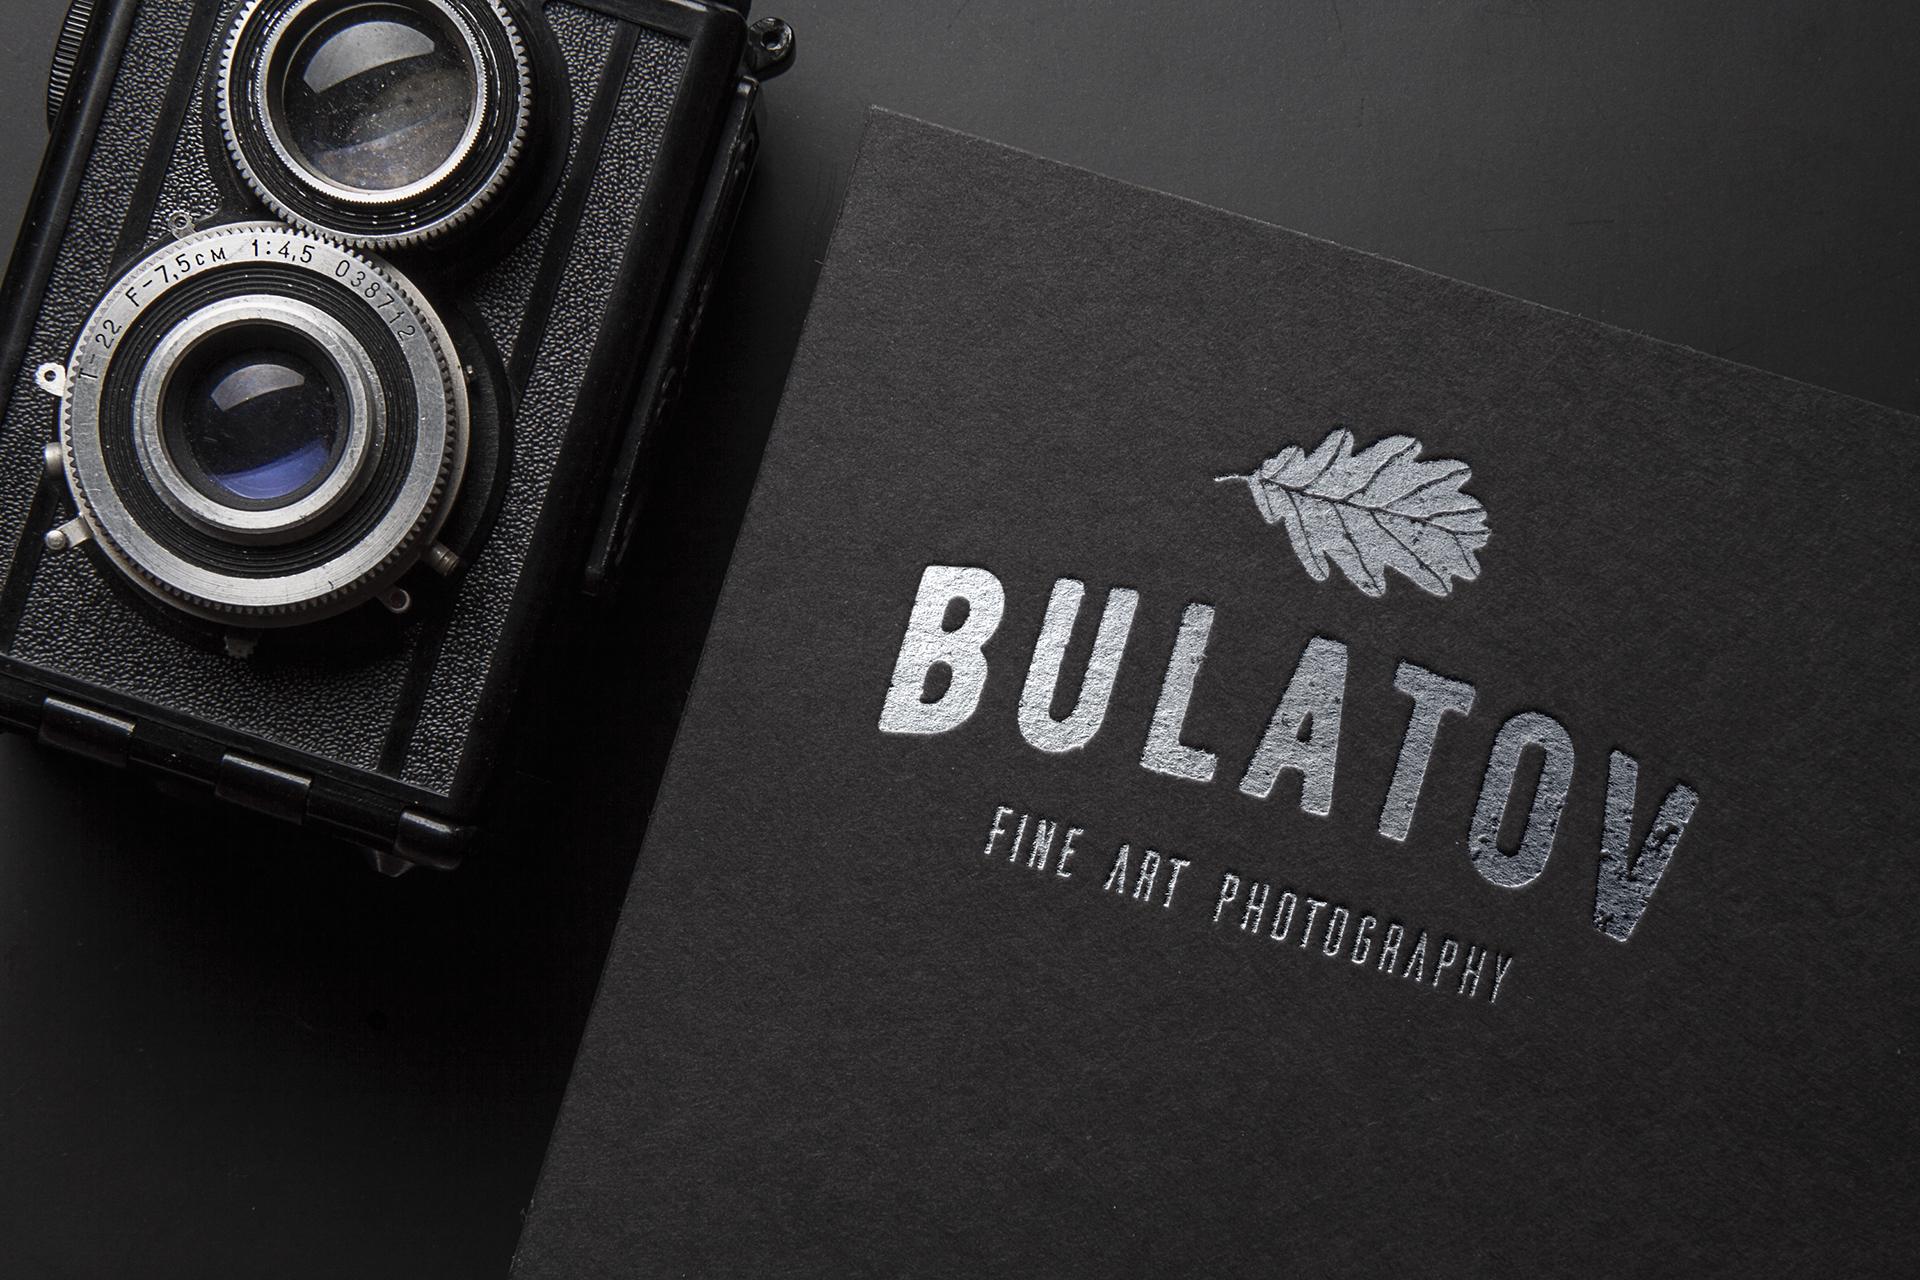 Логотип фотографа на фотографии